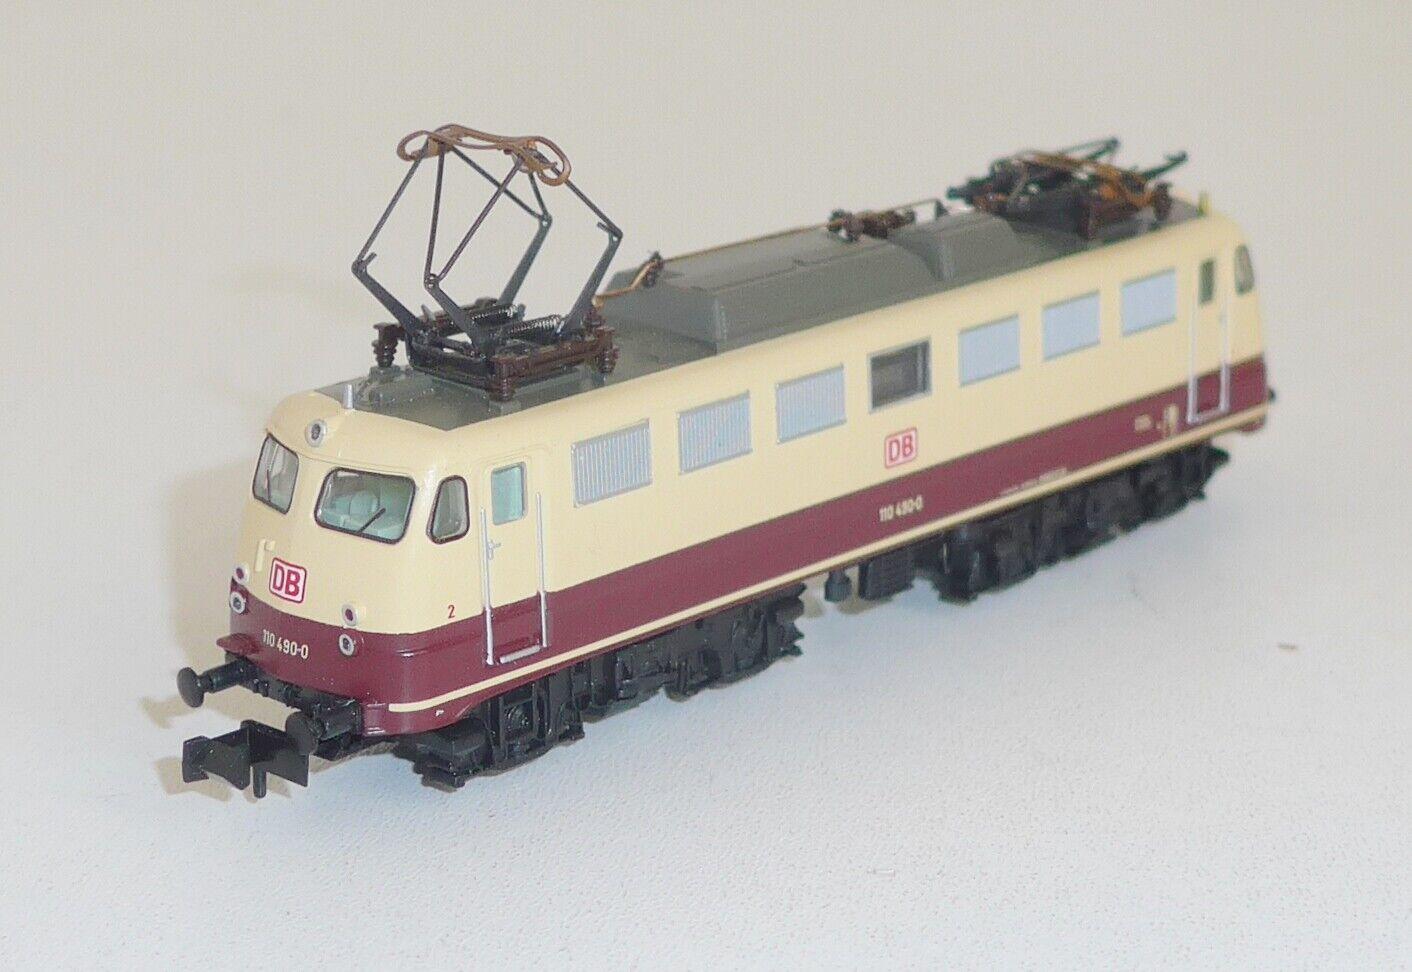 Hobbytrain n 244500 DB e-Lok br 110 490-0 OVP pista n